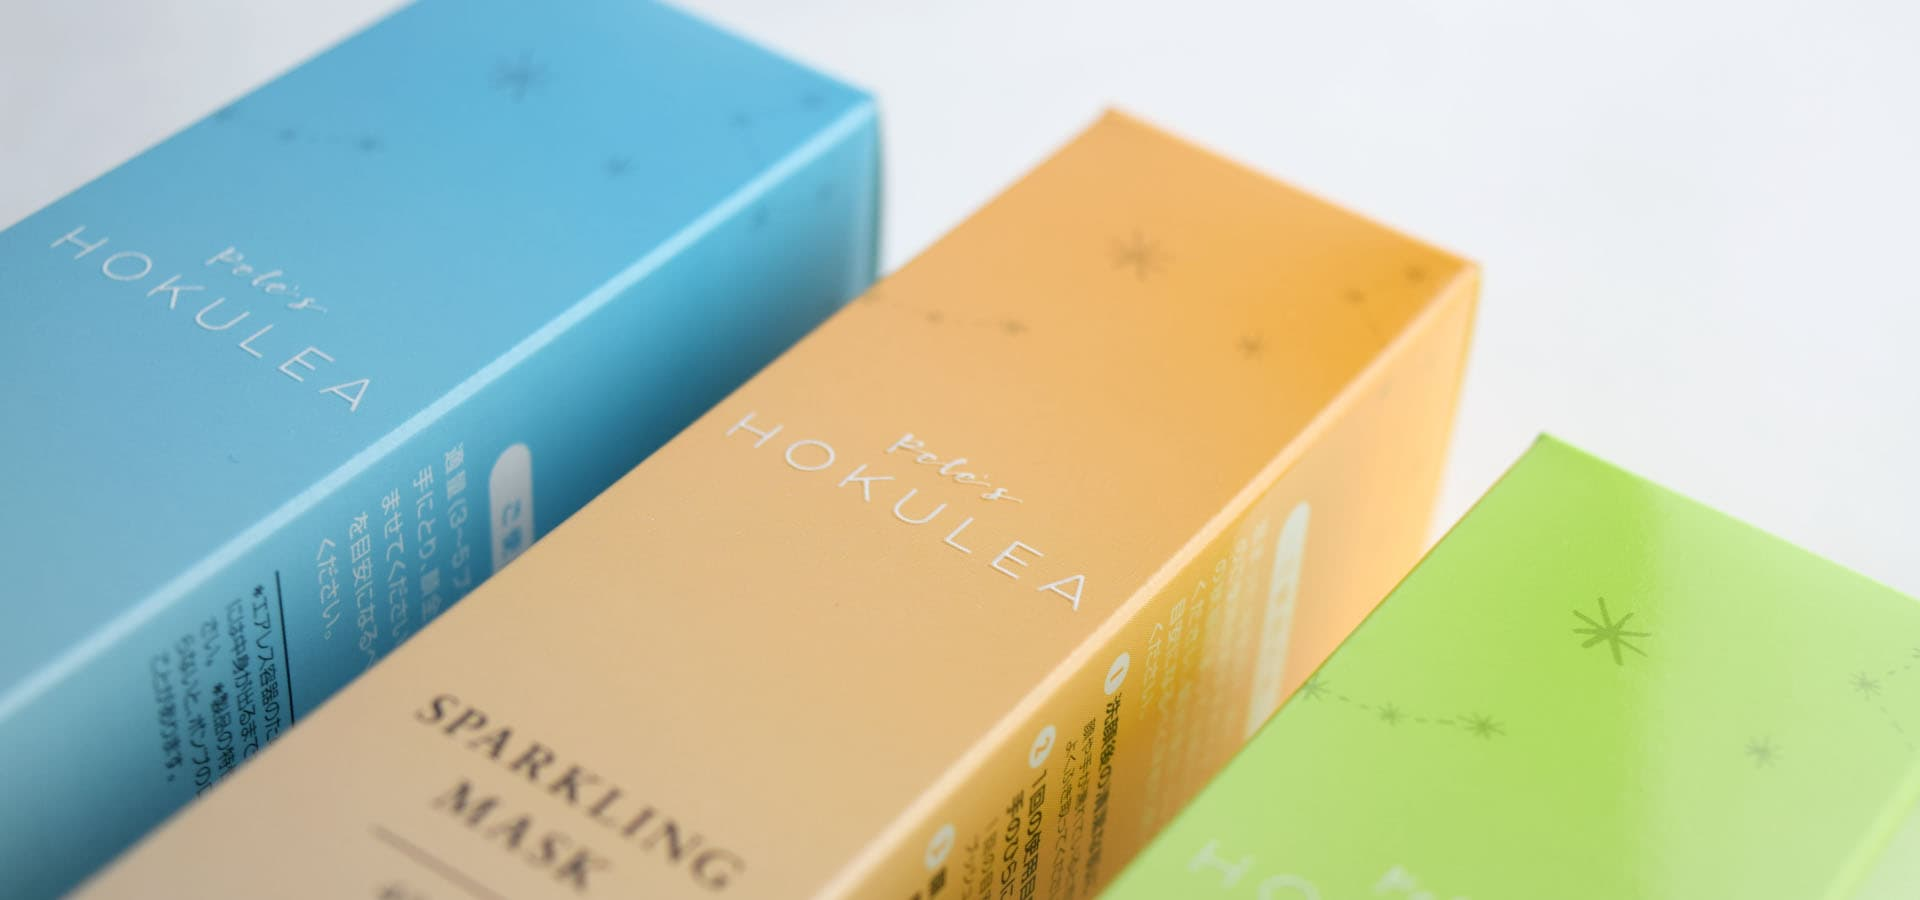 Pele's Hokulea Package Design